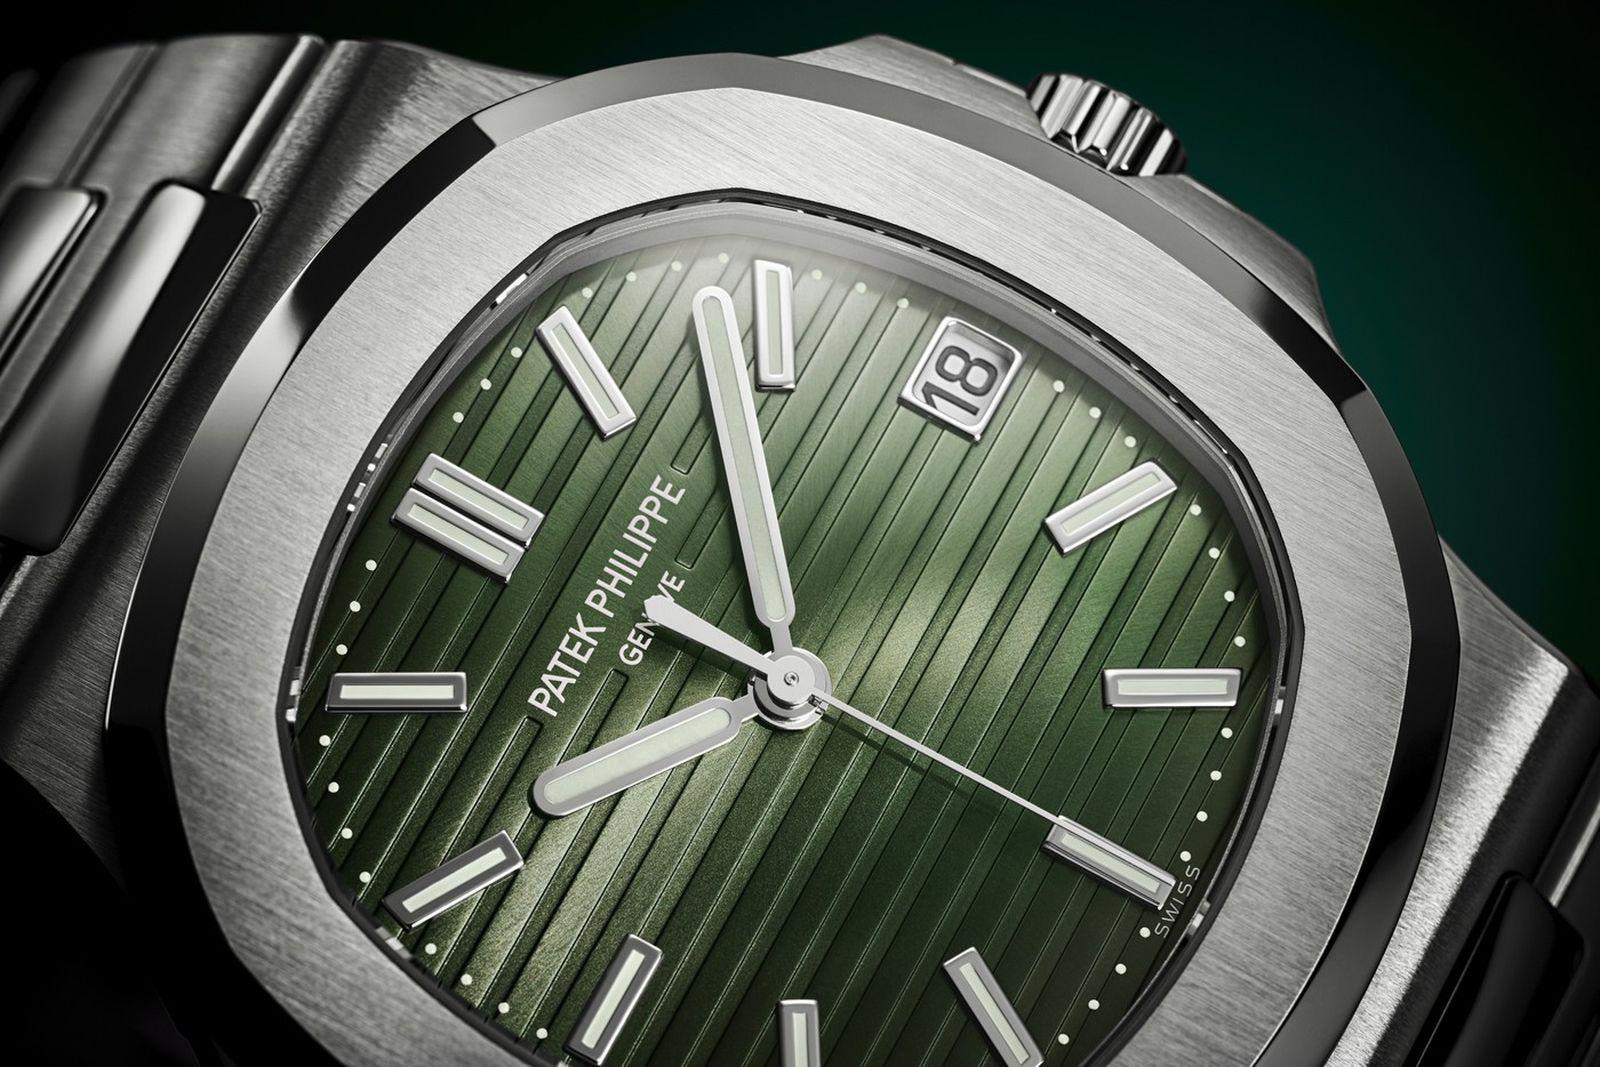 patek-plippe-nautilus-5711-olive-green-4